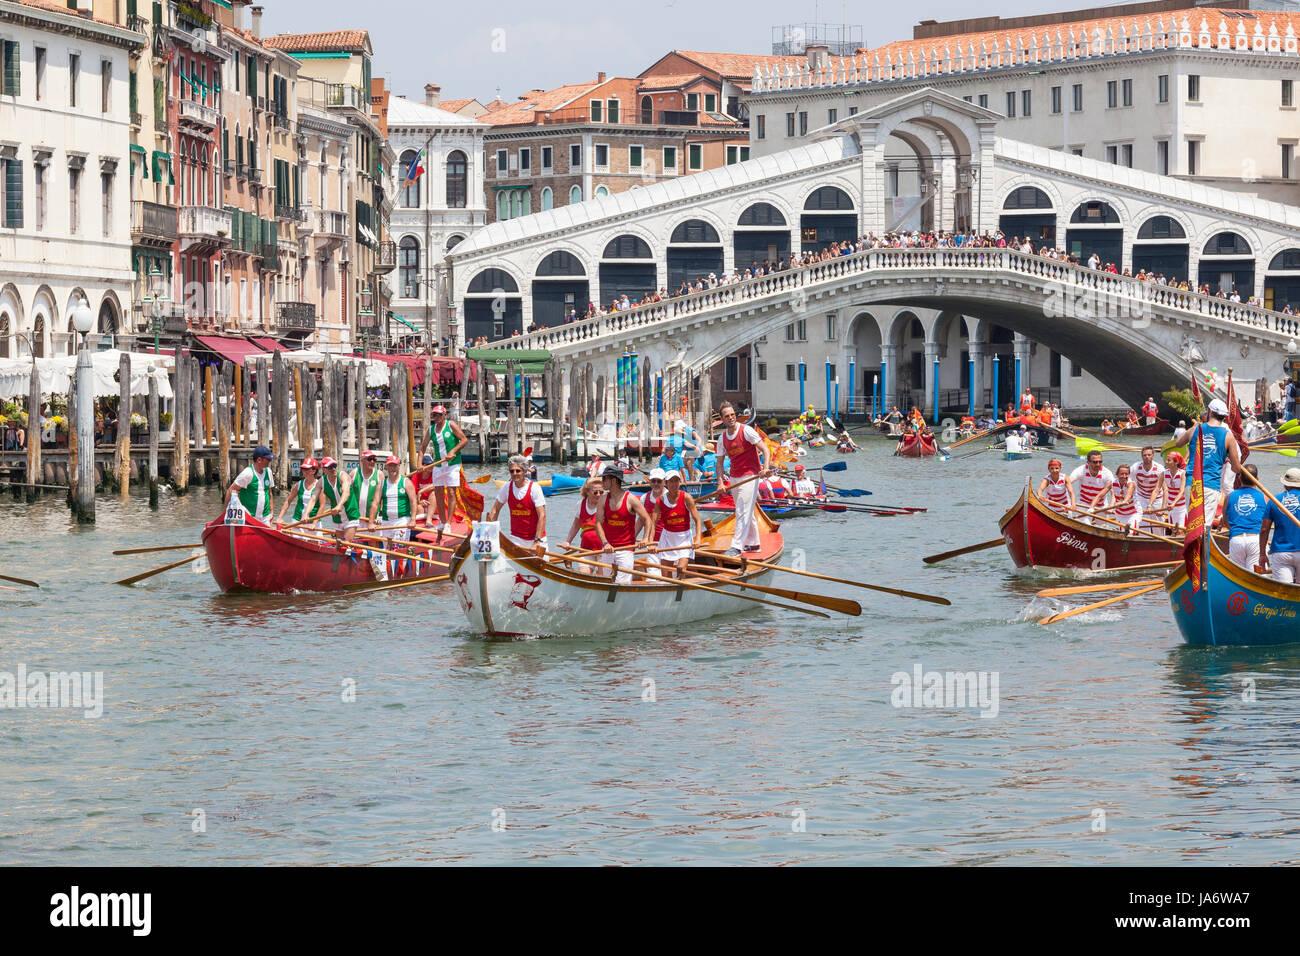 Venice, Veneto, Italy 4th June 2017. The finish of the 43rd Vogalonga regatta with the boats passing under the Rialto - Stock Image